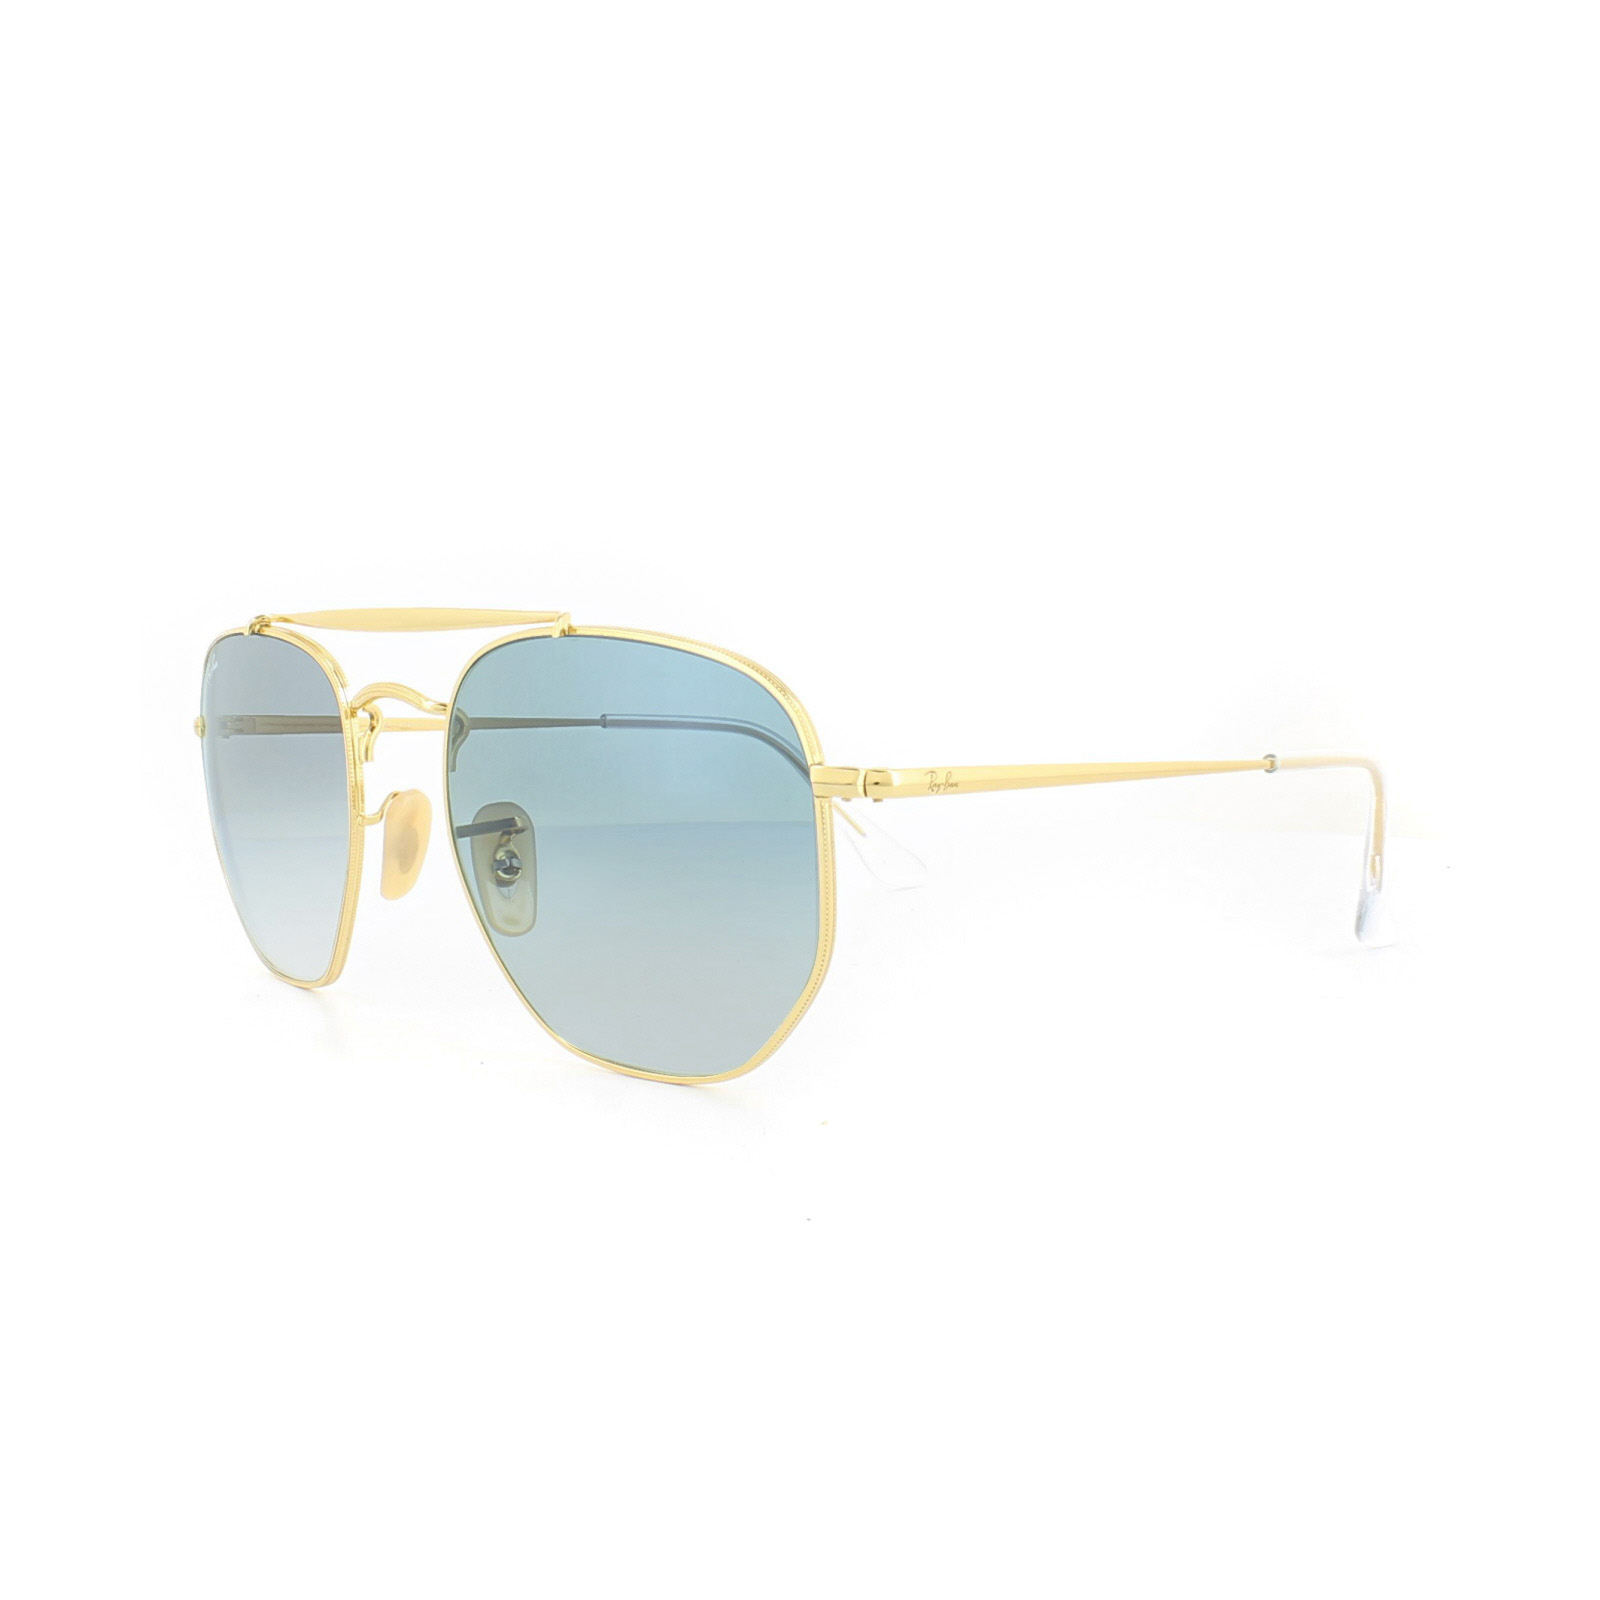 4bbfc2ecb9cfa Cheap Ray-Ban Marshal 3648 Sunglasses - Discounted Sunglasses